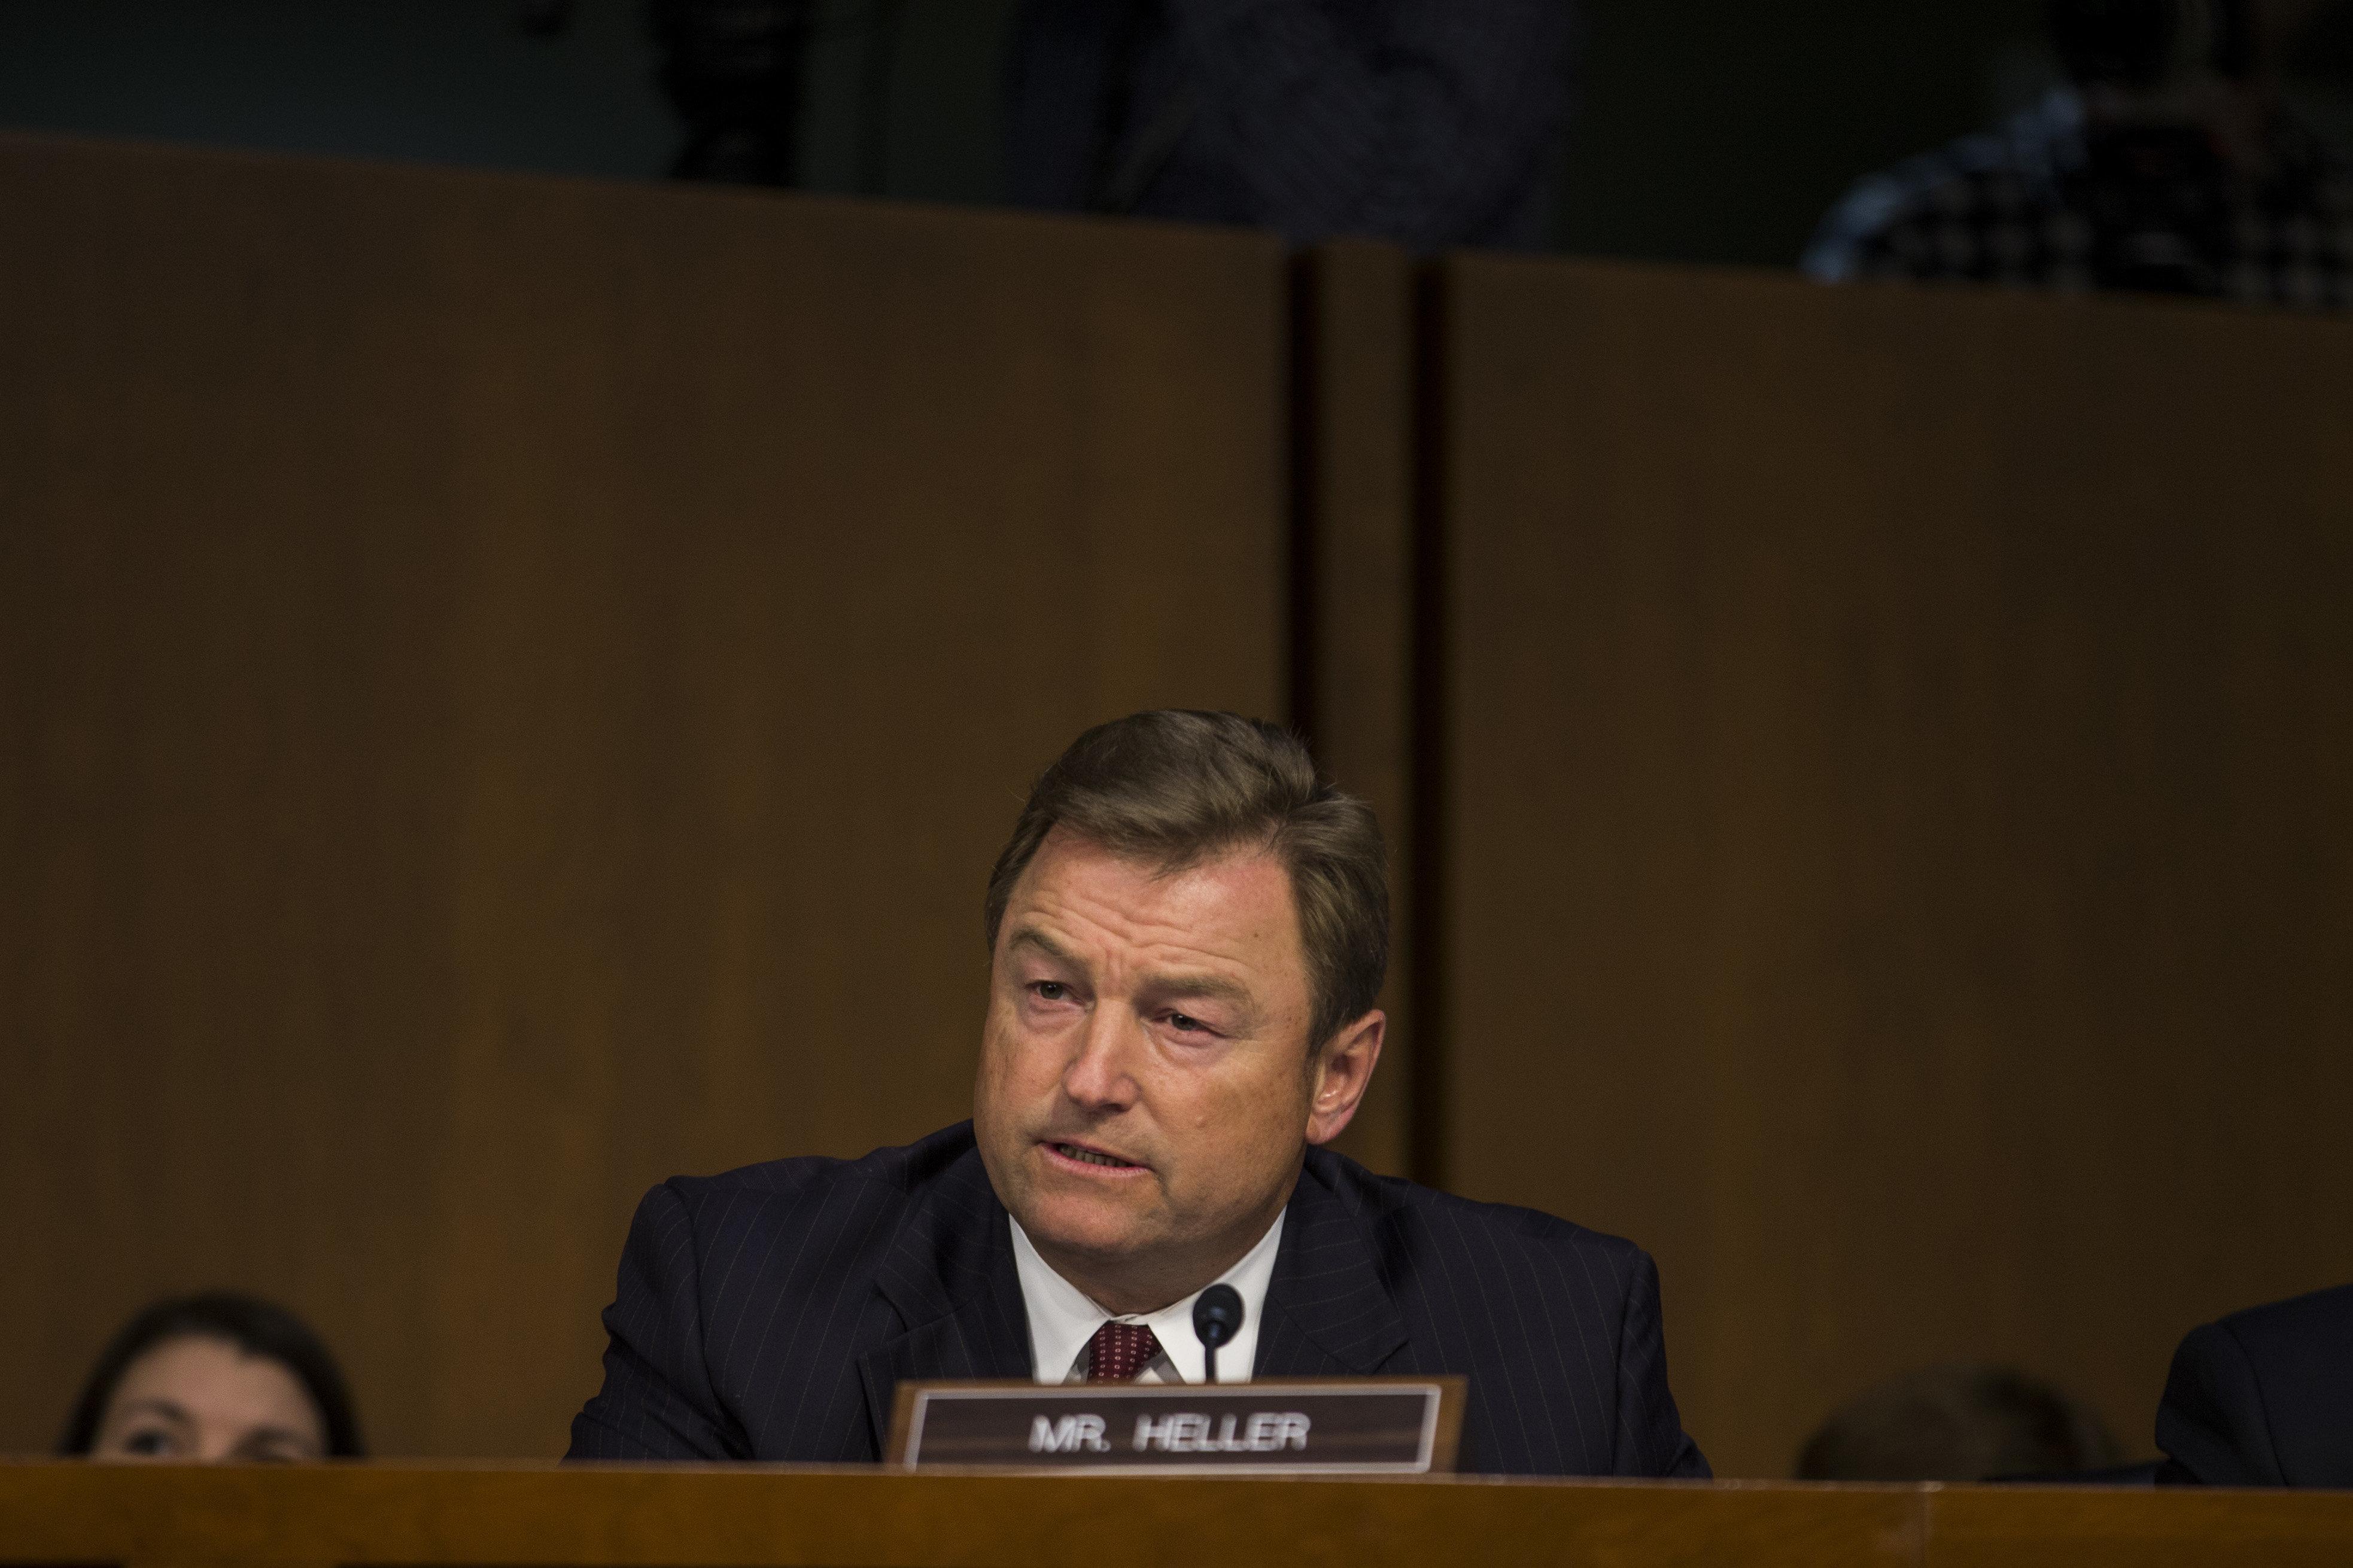 Republican Sen. Dean Heller of Nevada